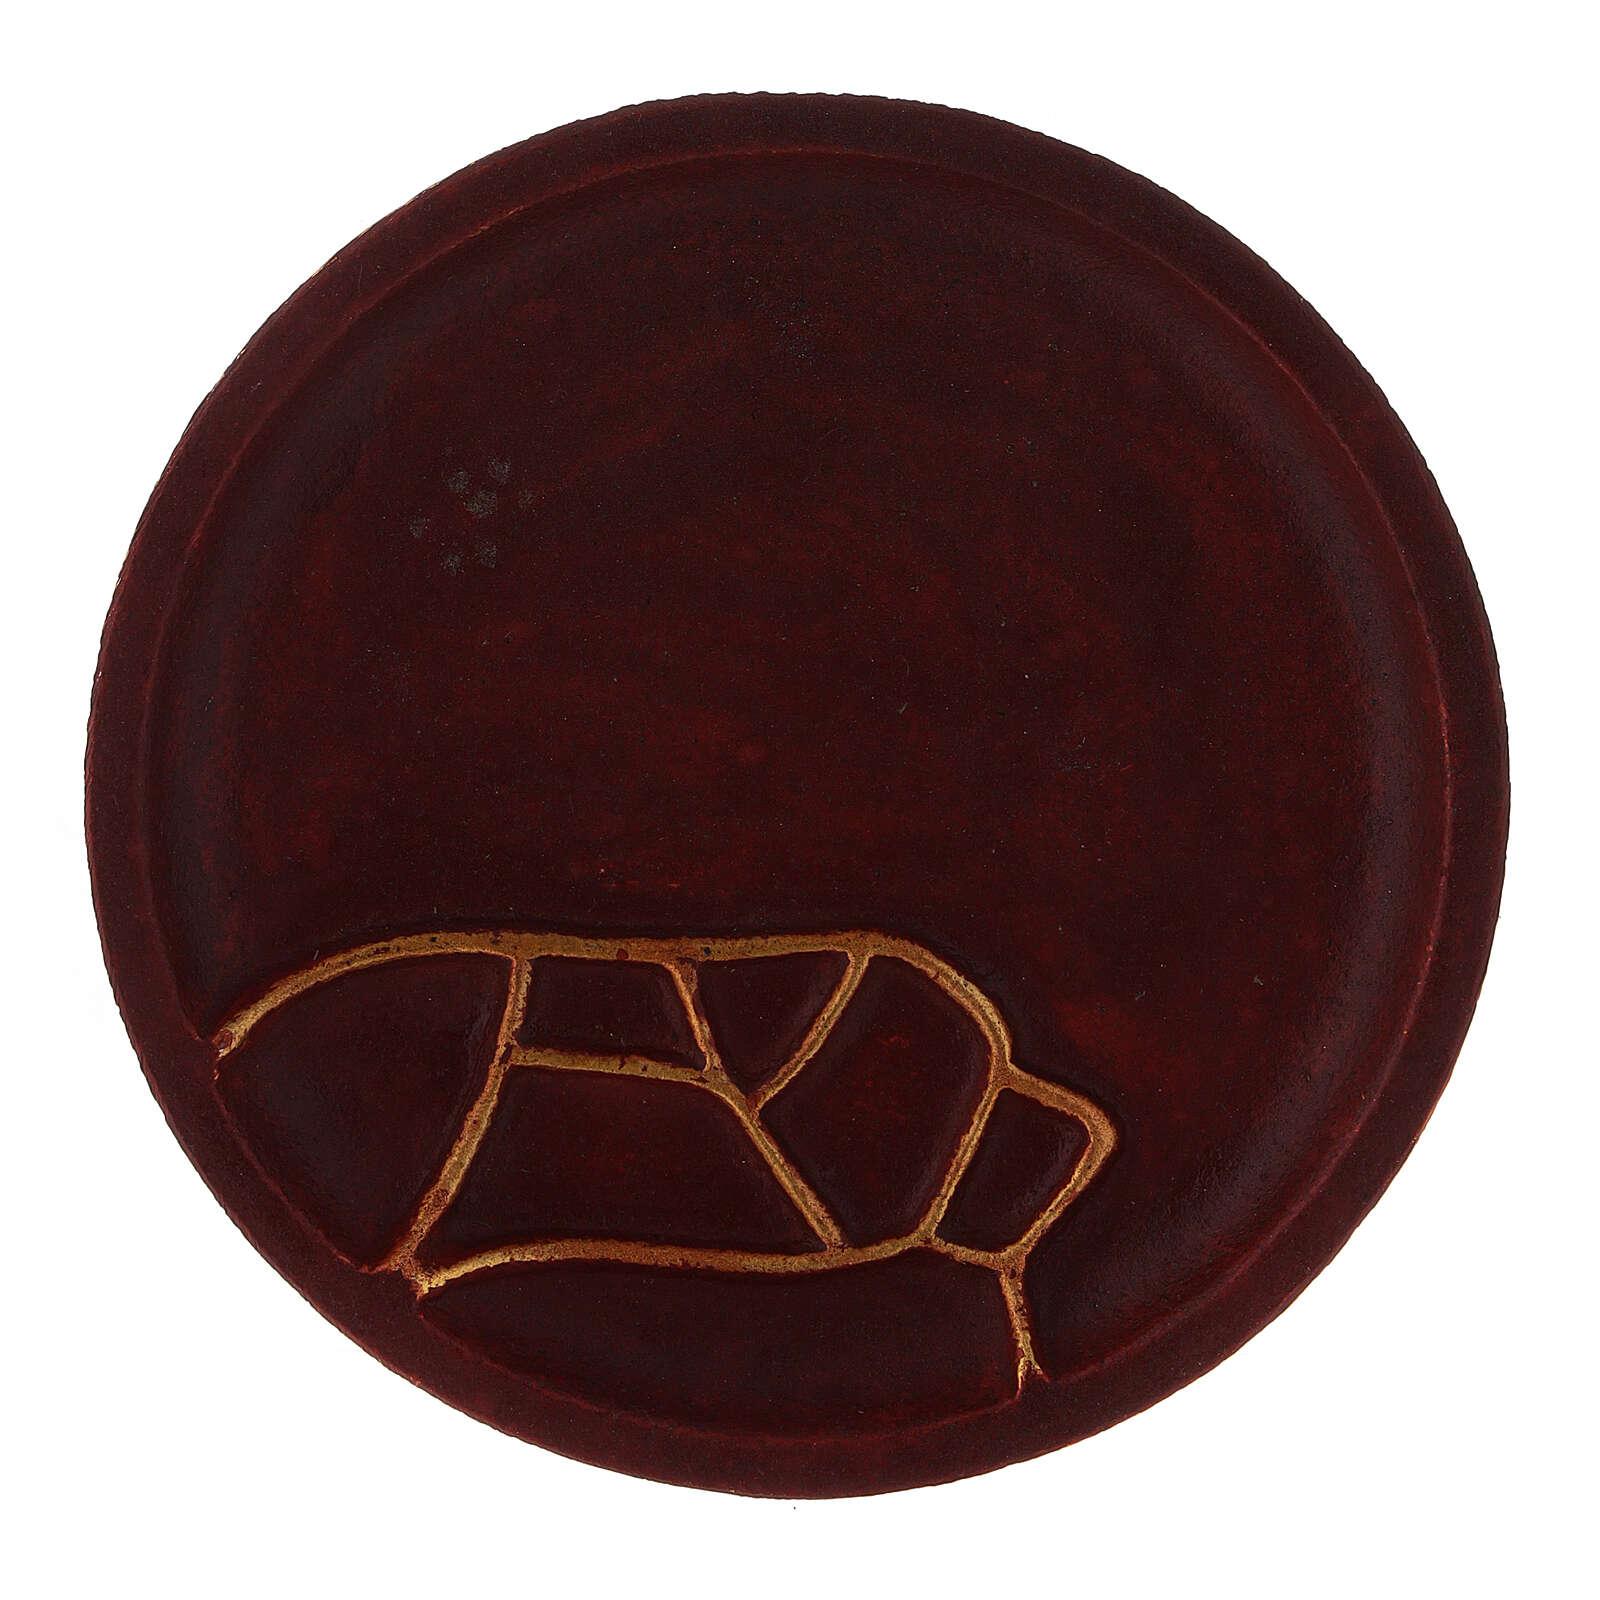 Piatto portacandela alluminio rosso diametro 12 cm 3